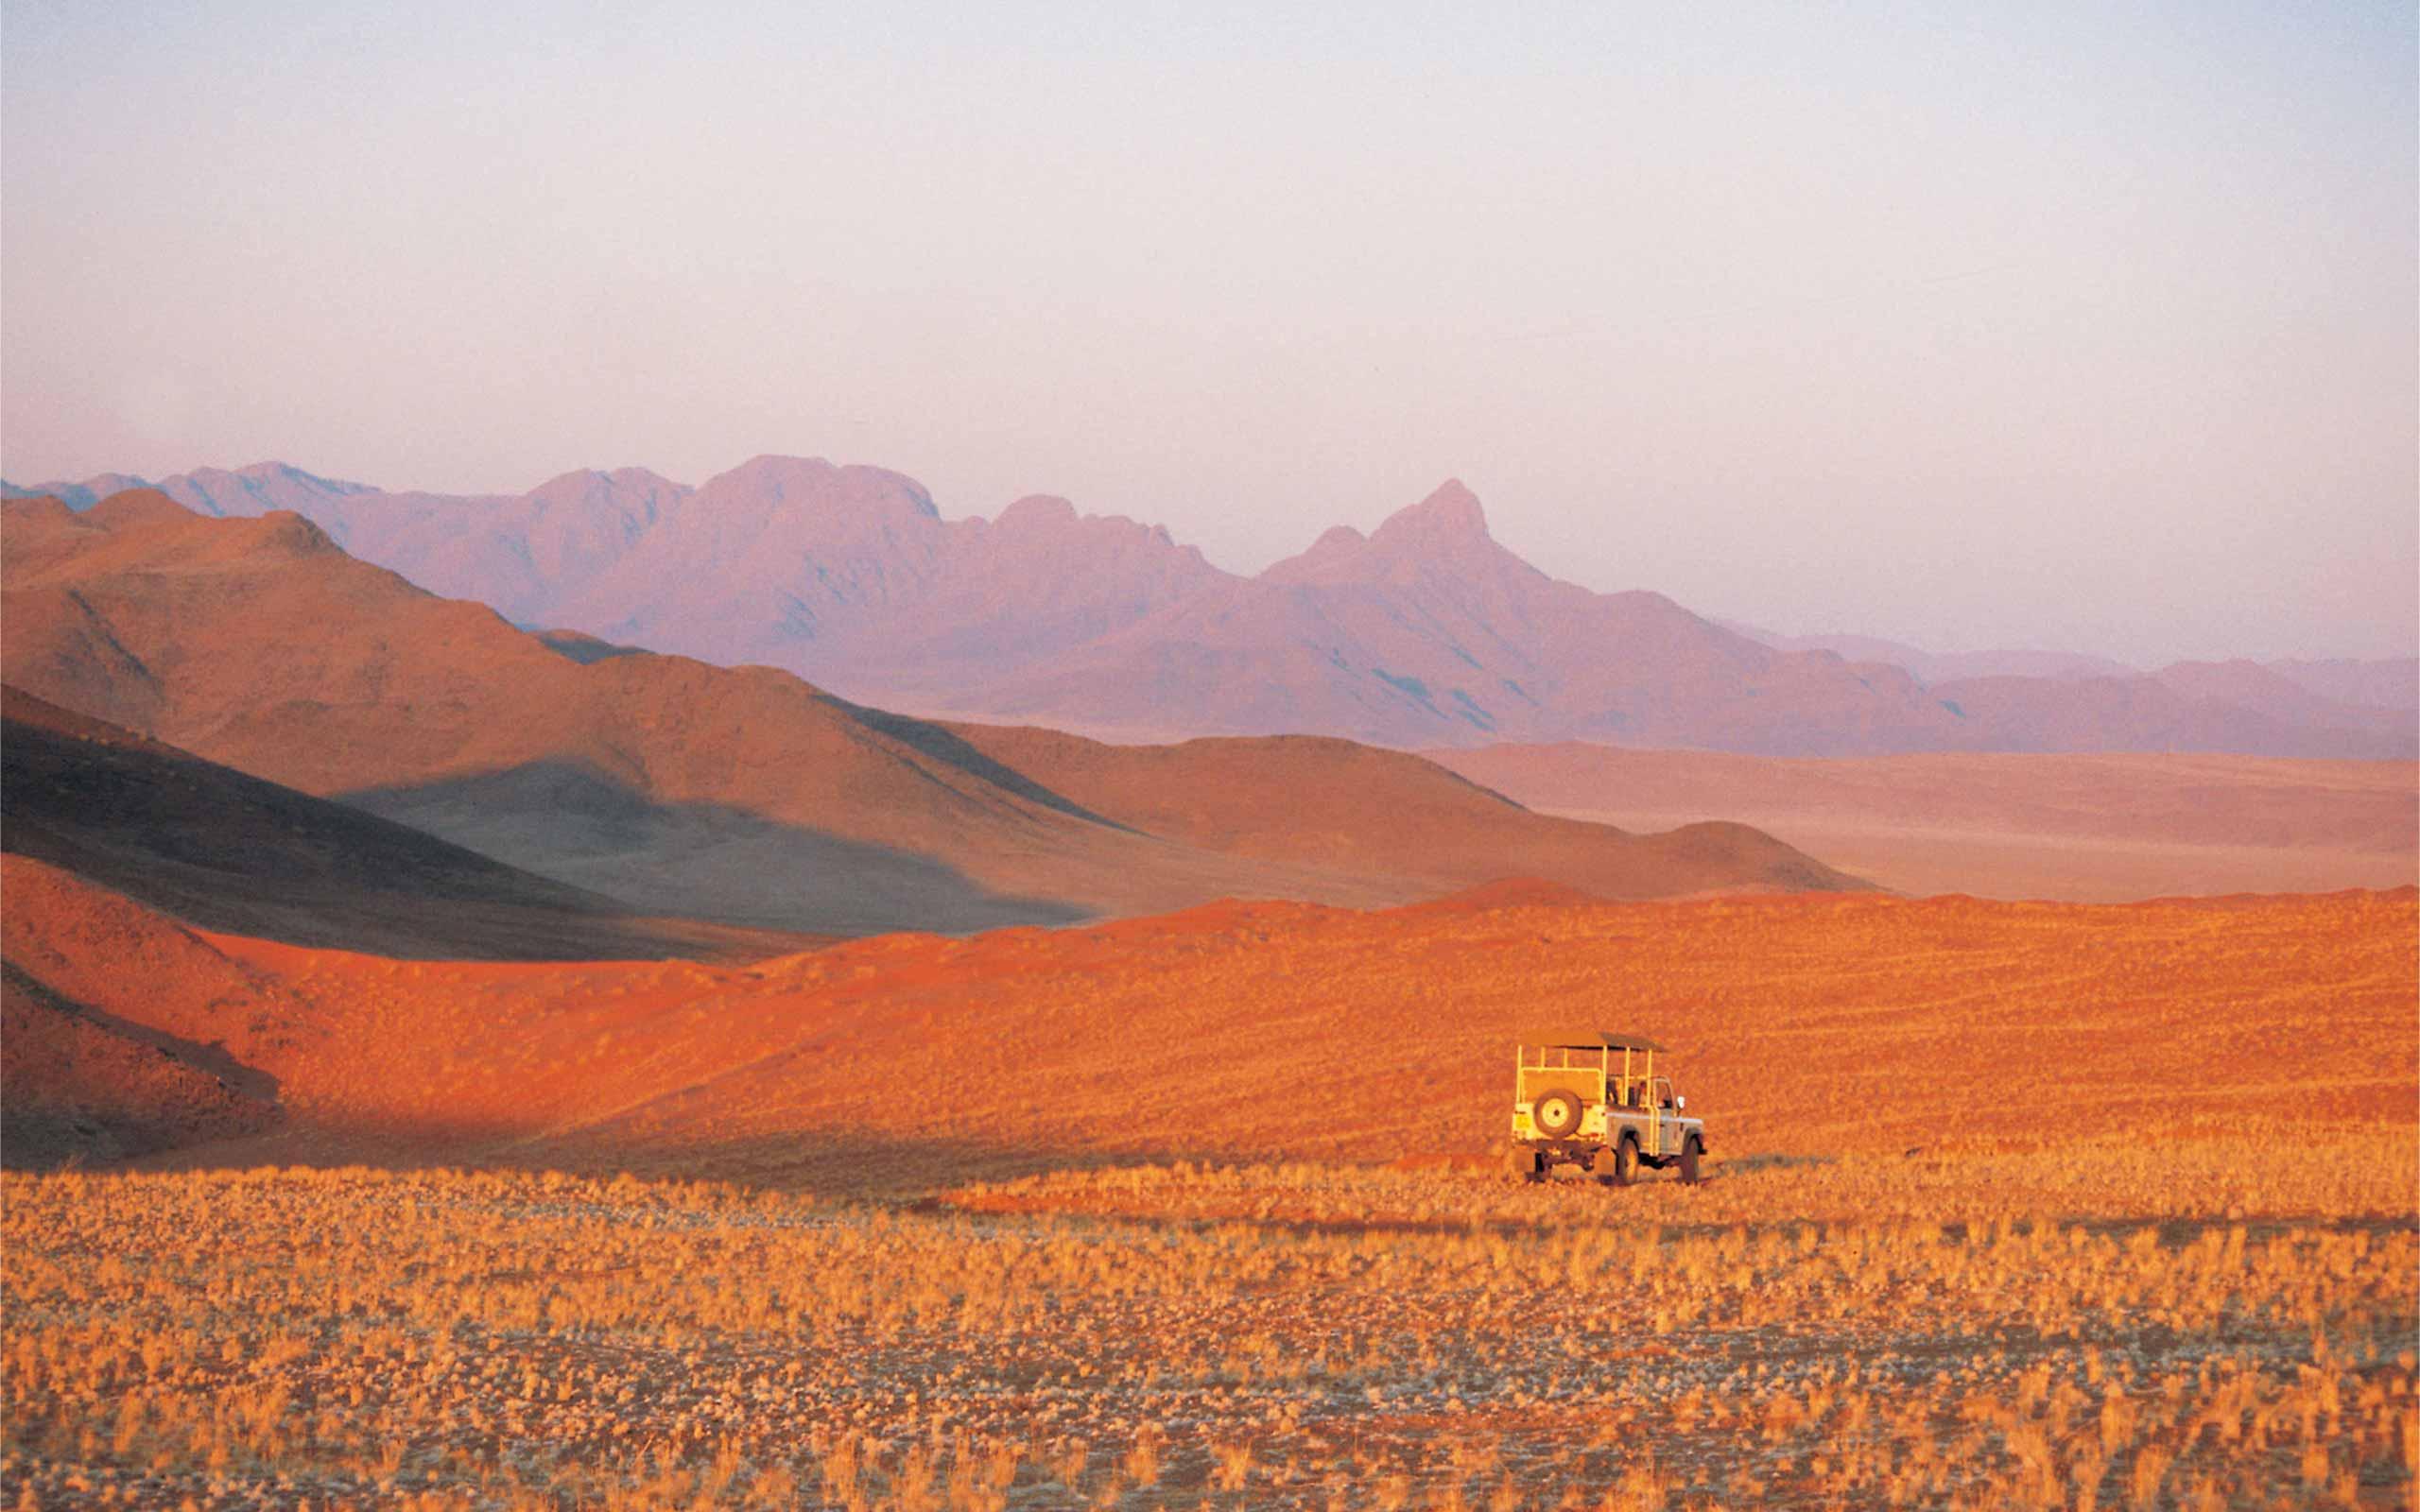 enkosi-africa-safari-namibia-namibrand-wolwedans-landscape